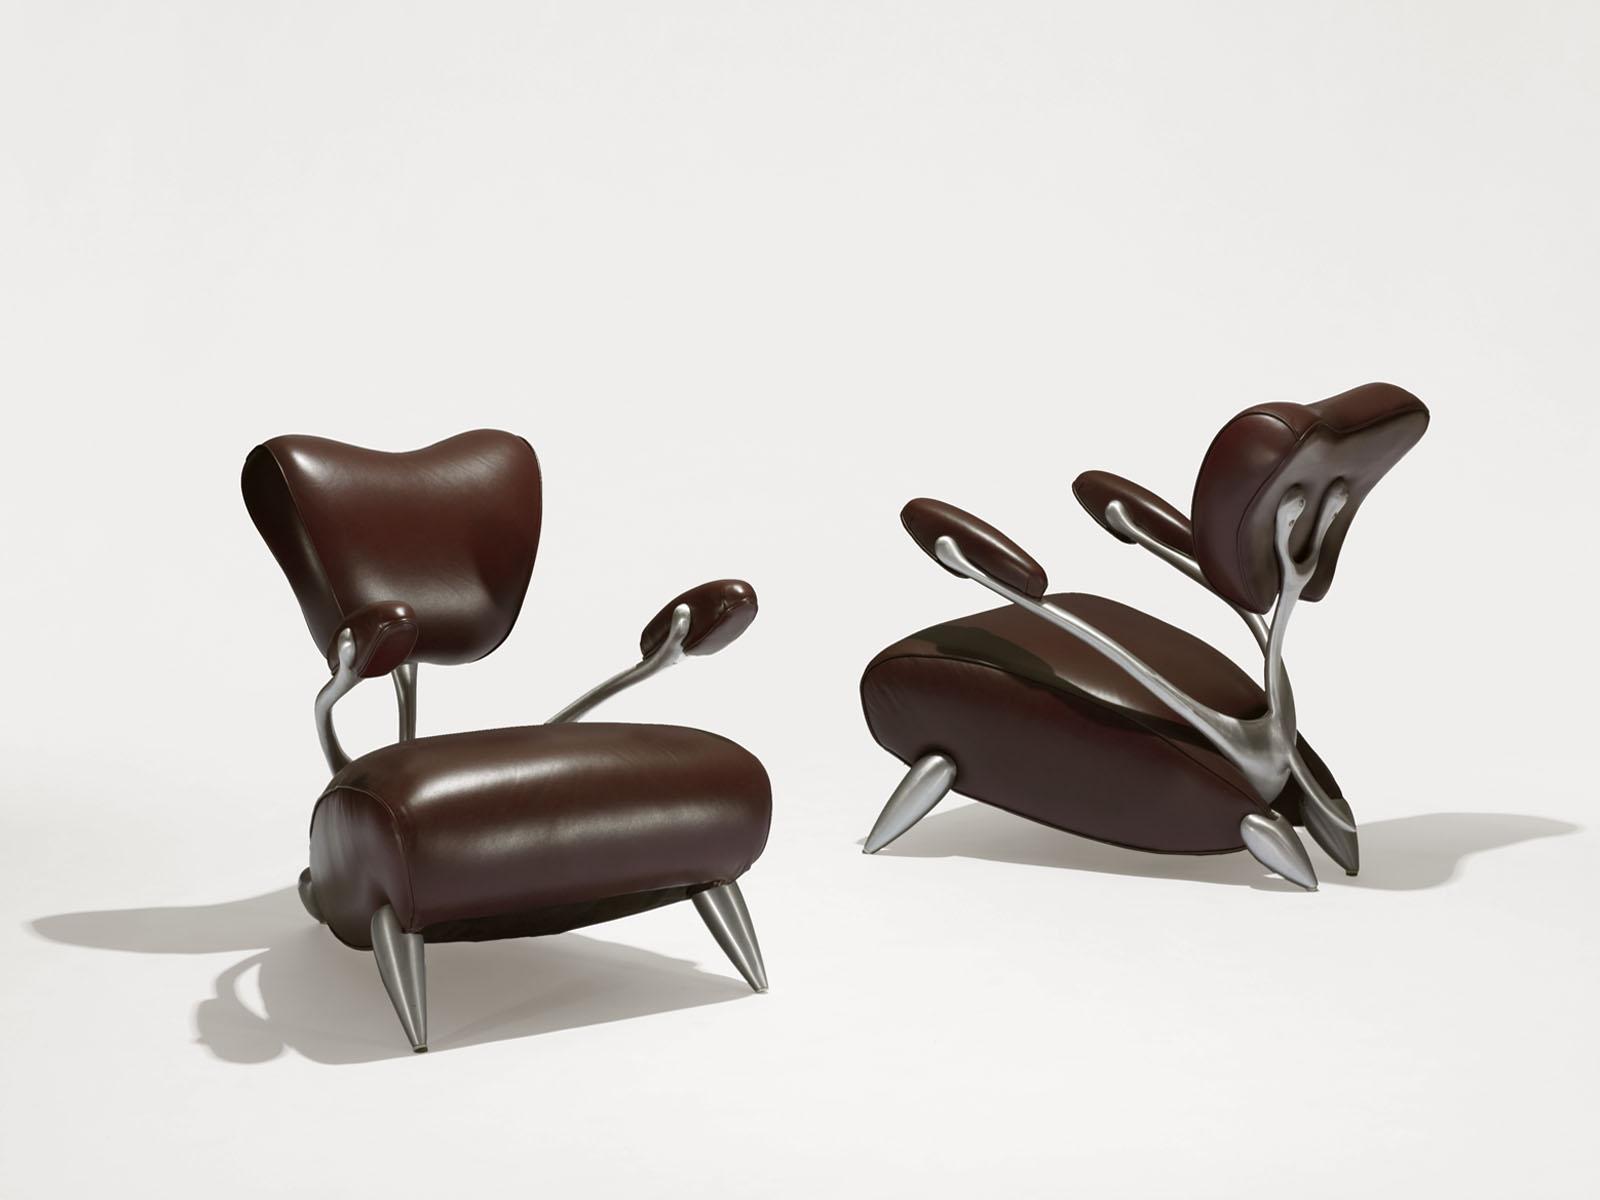 wright hudson chairs.jpg